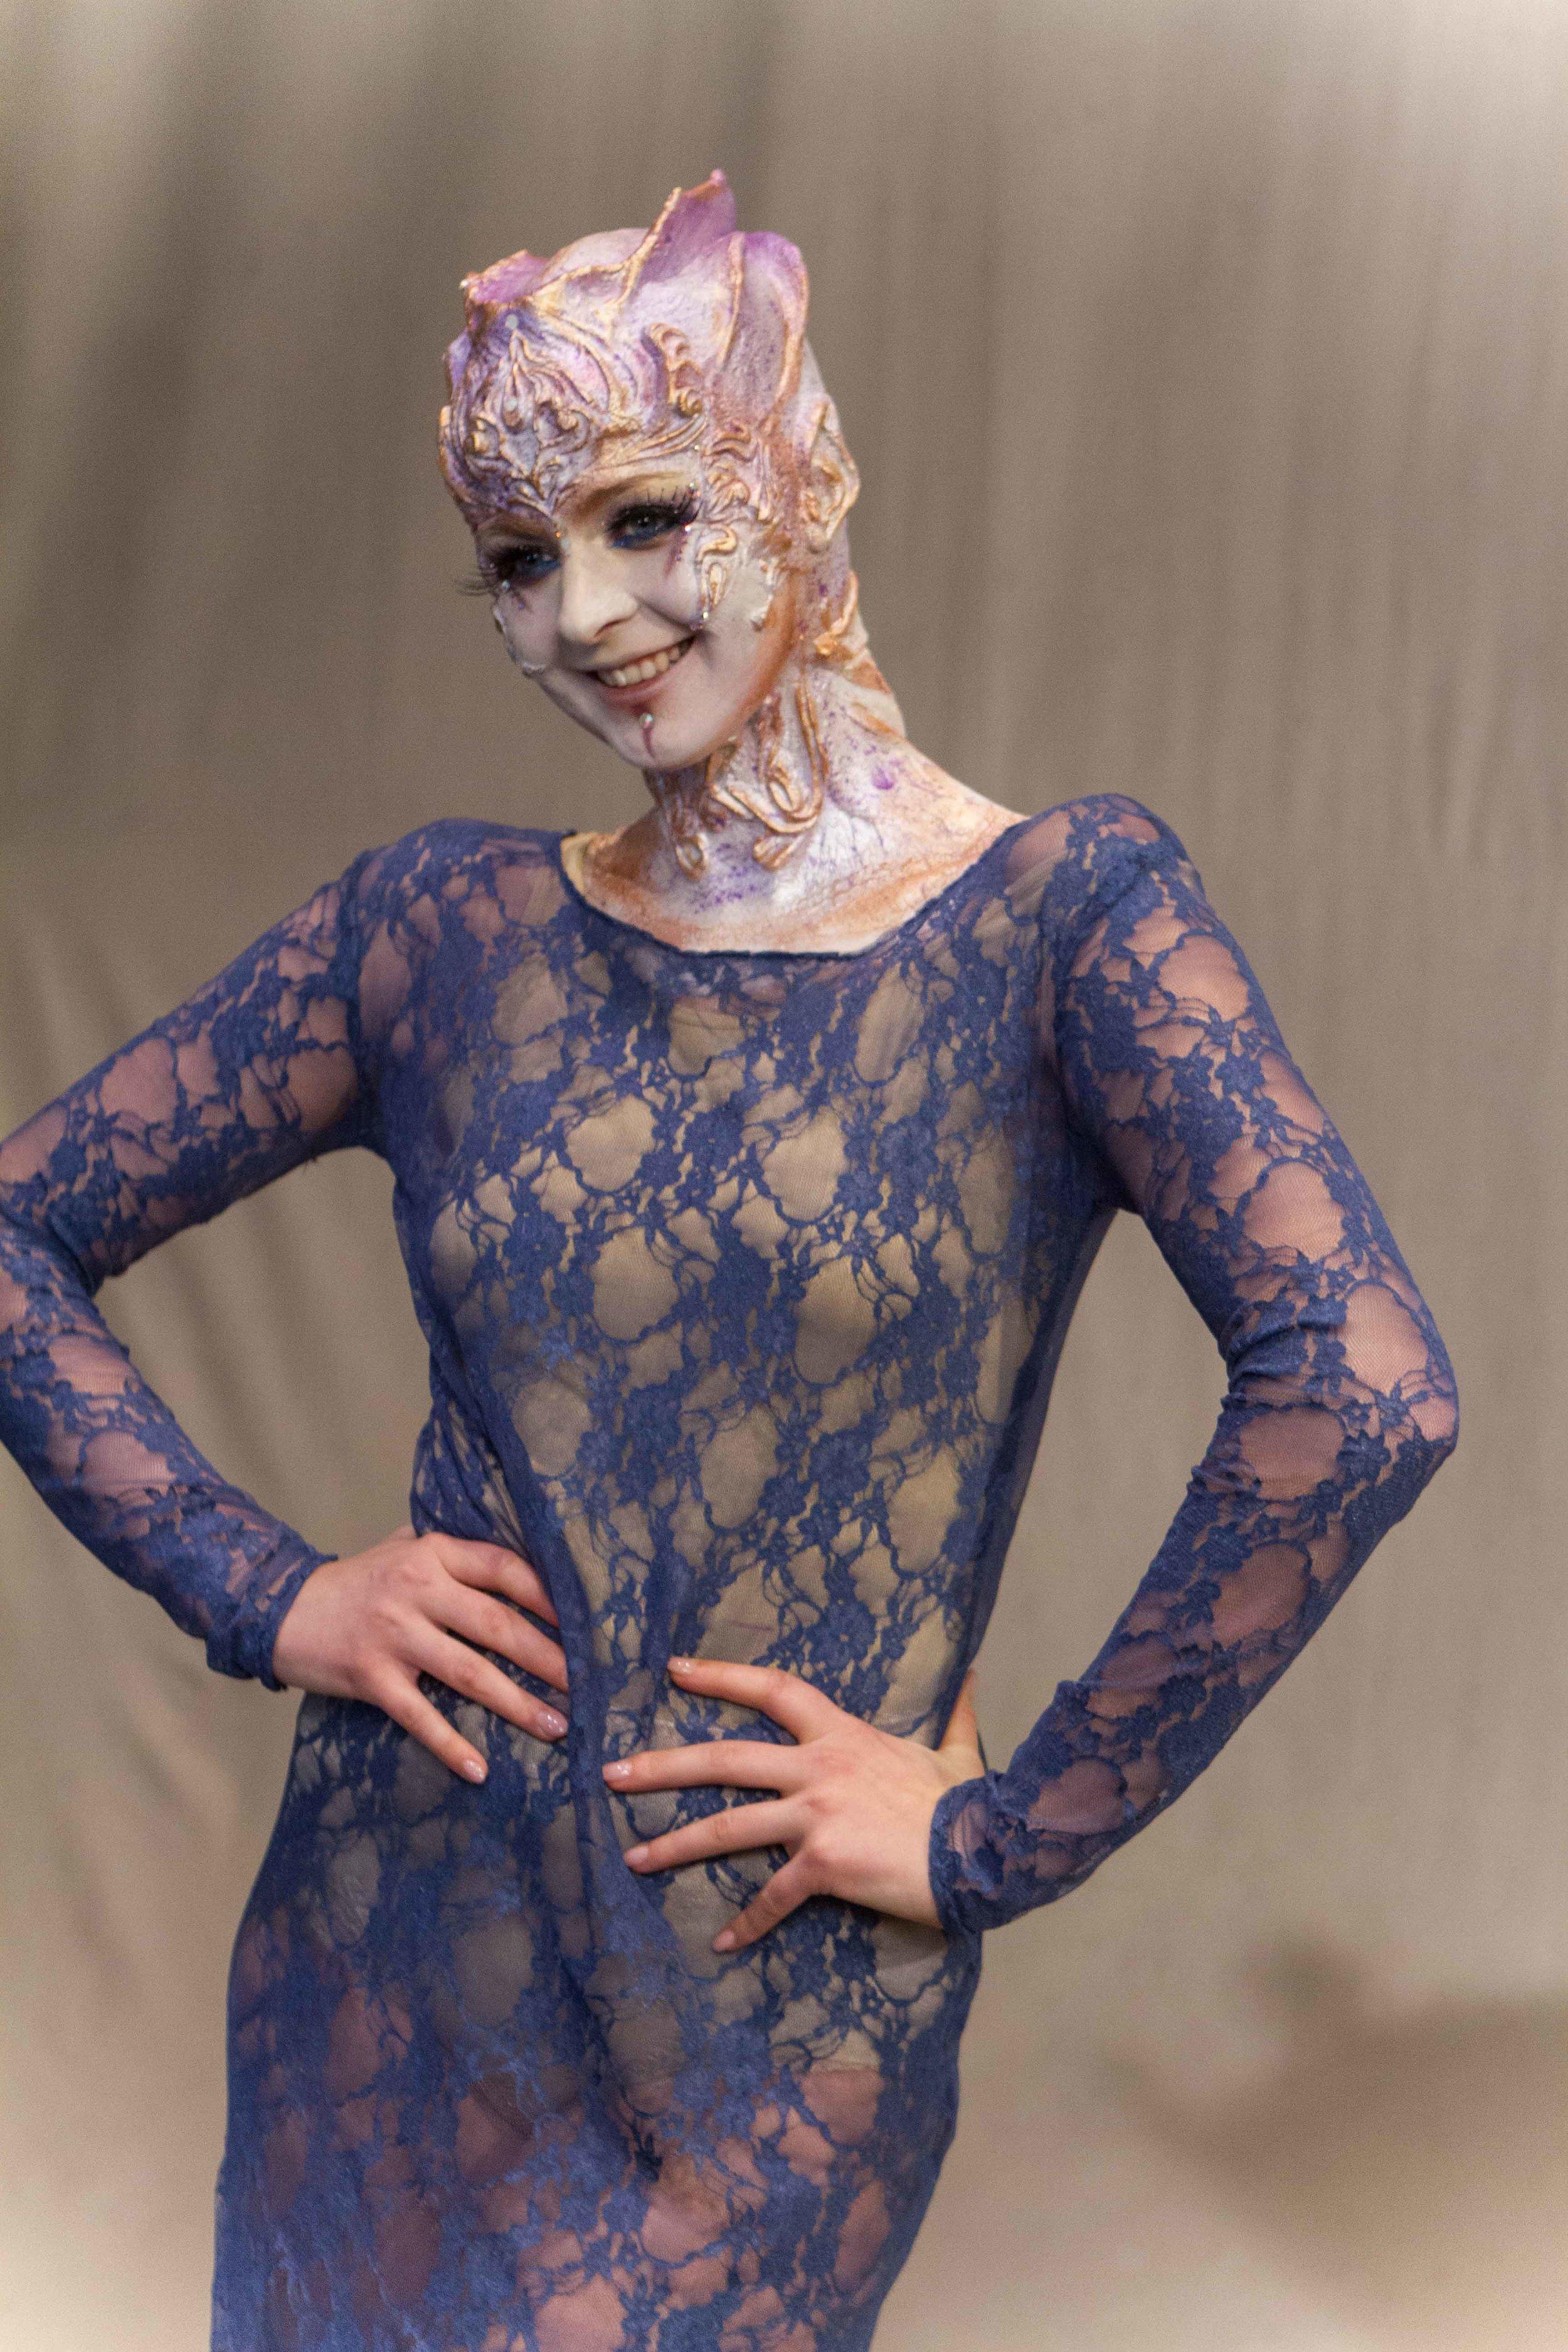 IMATS 2017 - Kristina Asztalos Beauty SFX (www.KyleReaArt.com - www.KyleReaPhotography.com) 2.jpg